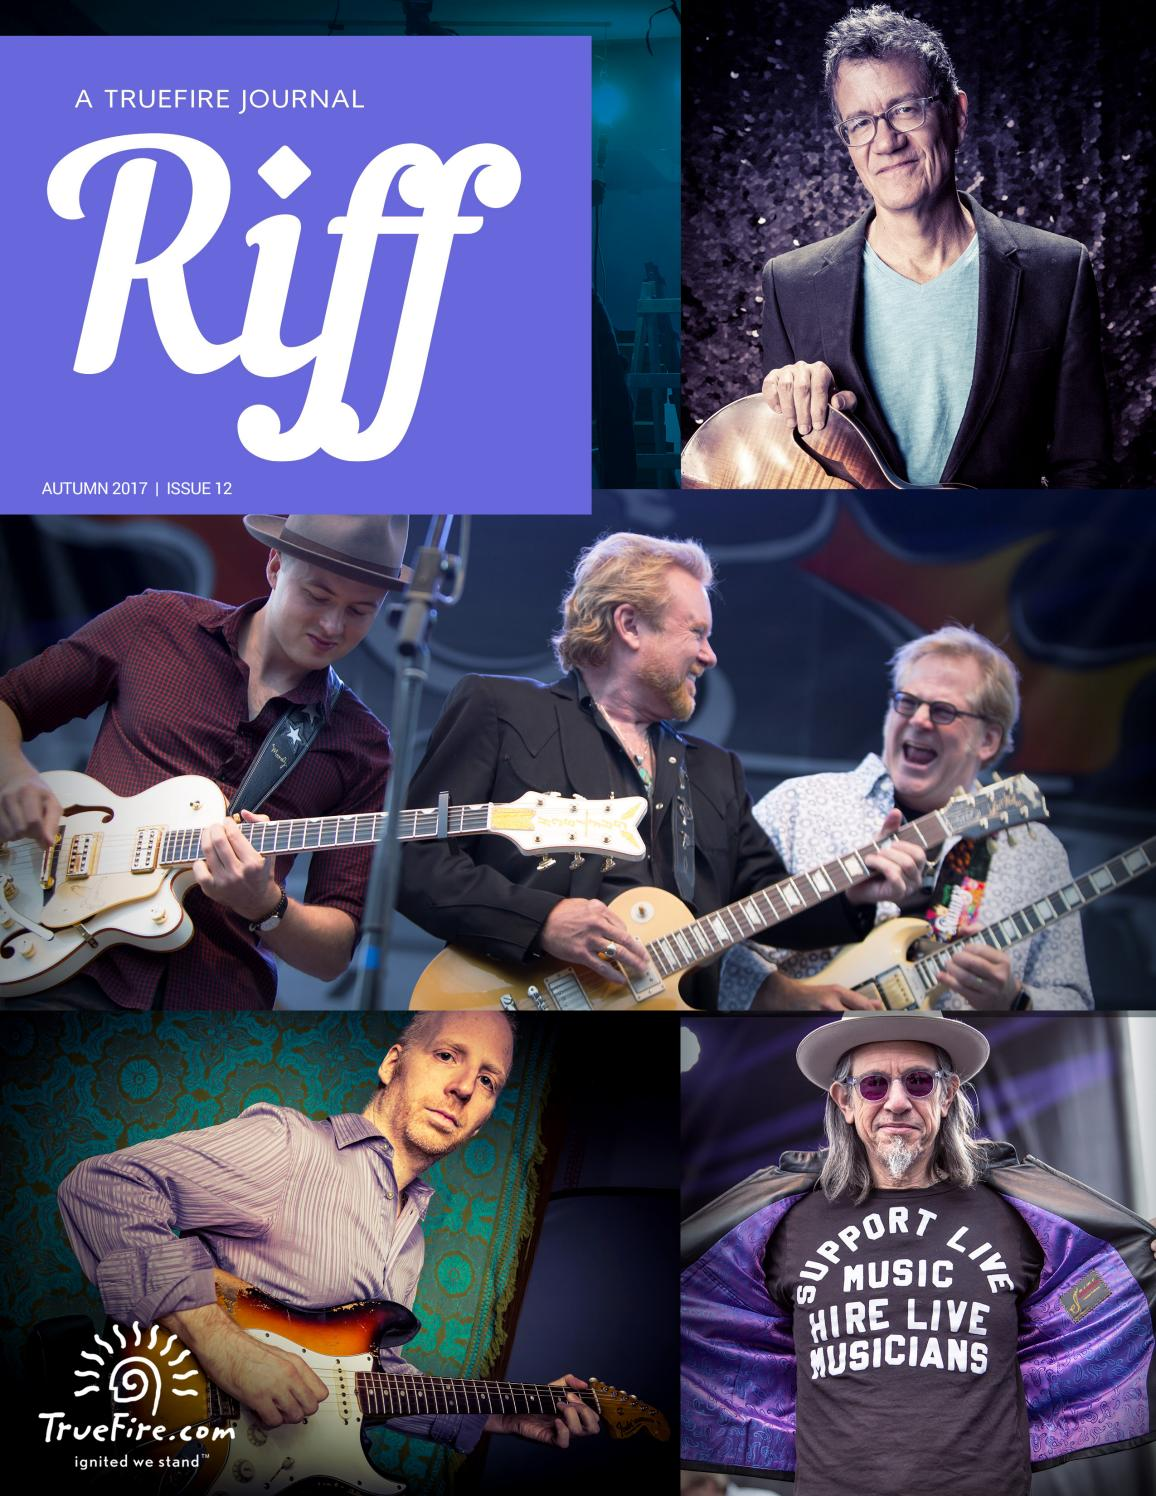 Riff journal spring 2015 issue 3 by riff journal issuu hexwebz Gallery